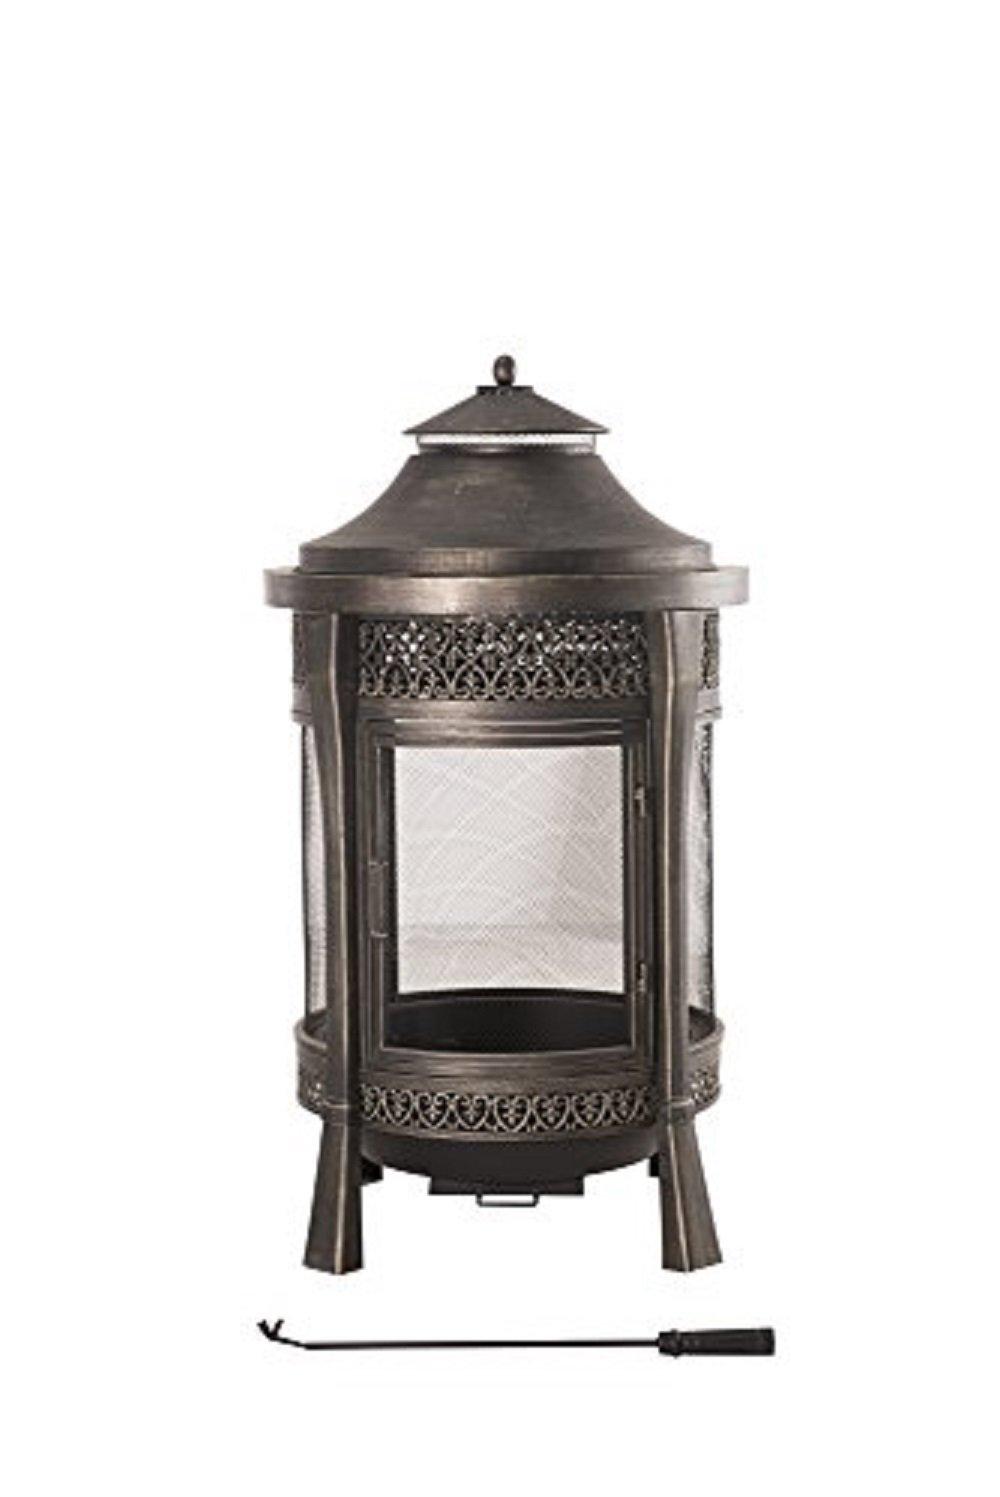 Sunjoy Large Cast Steel Outdoor Fireplace, 62'', Brown